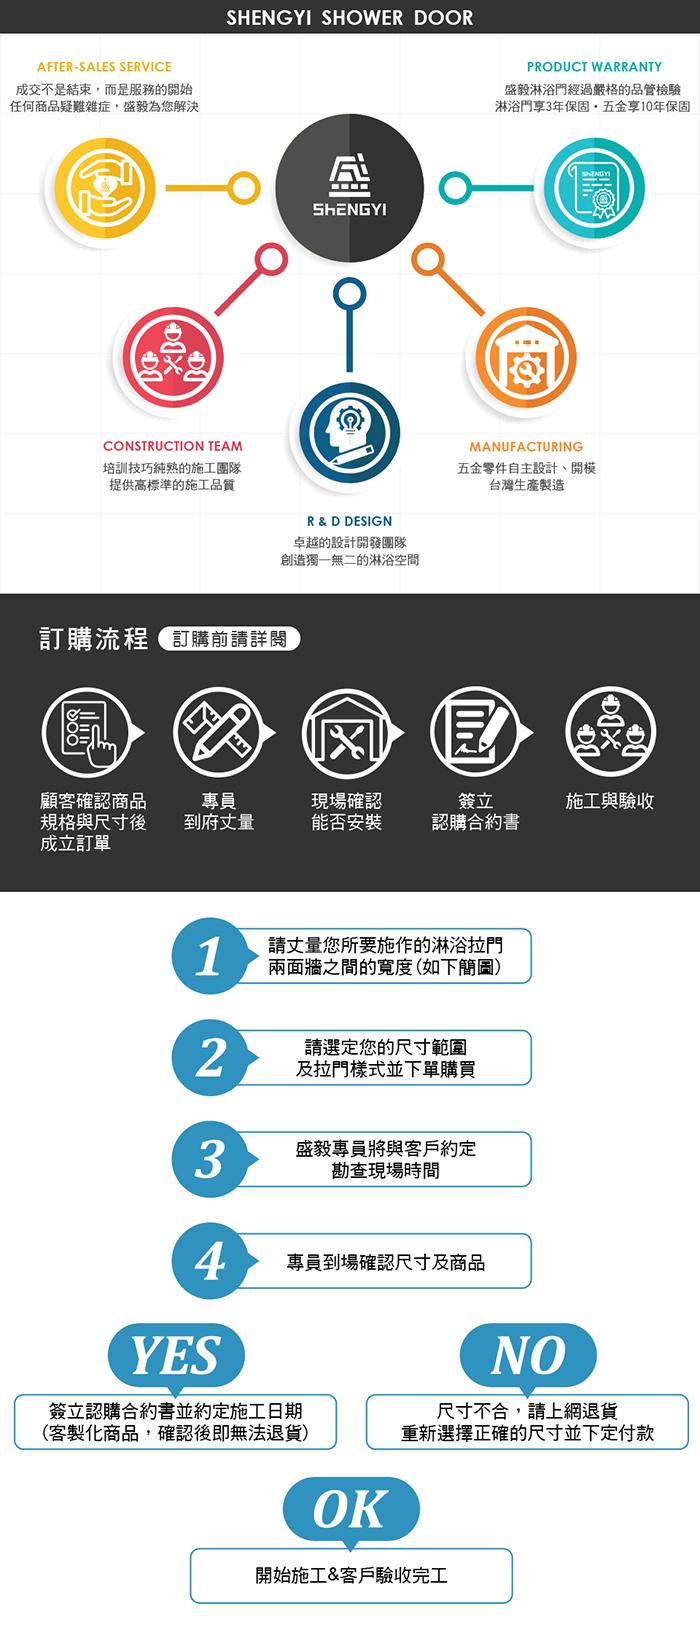 P4-訂購流程.jpg